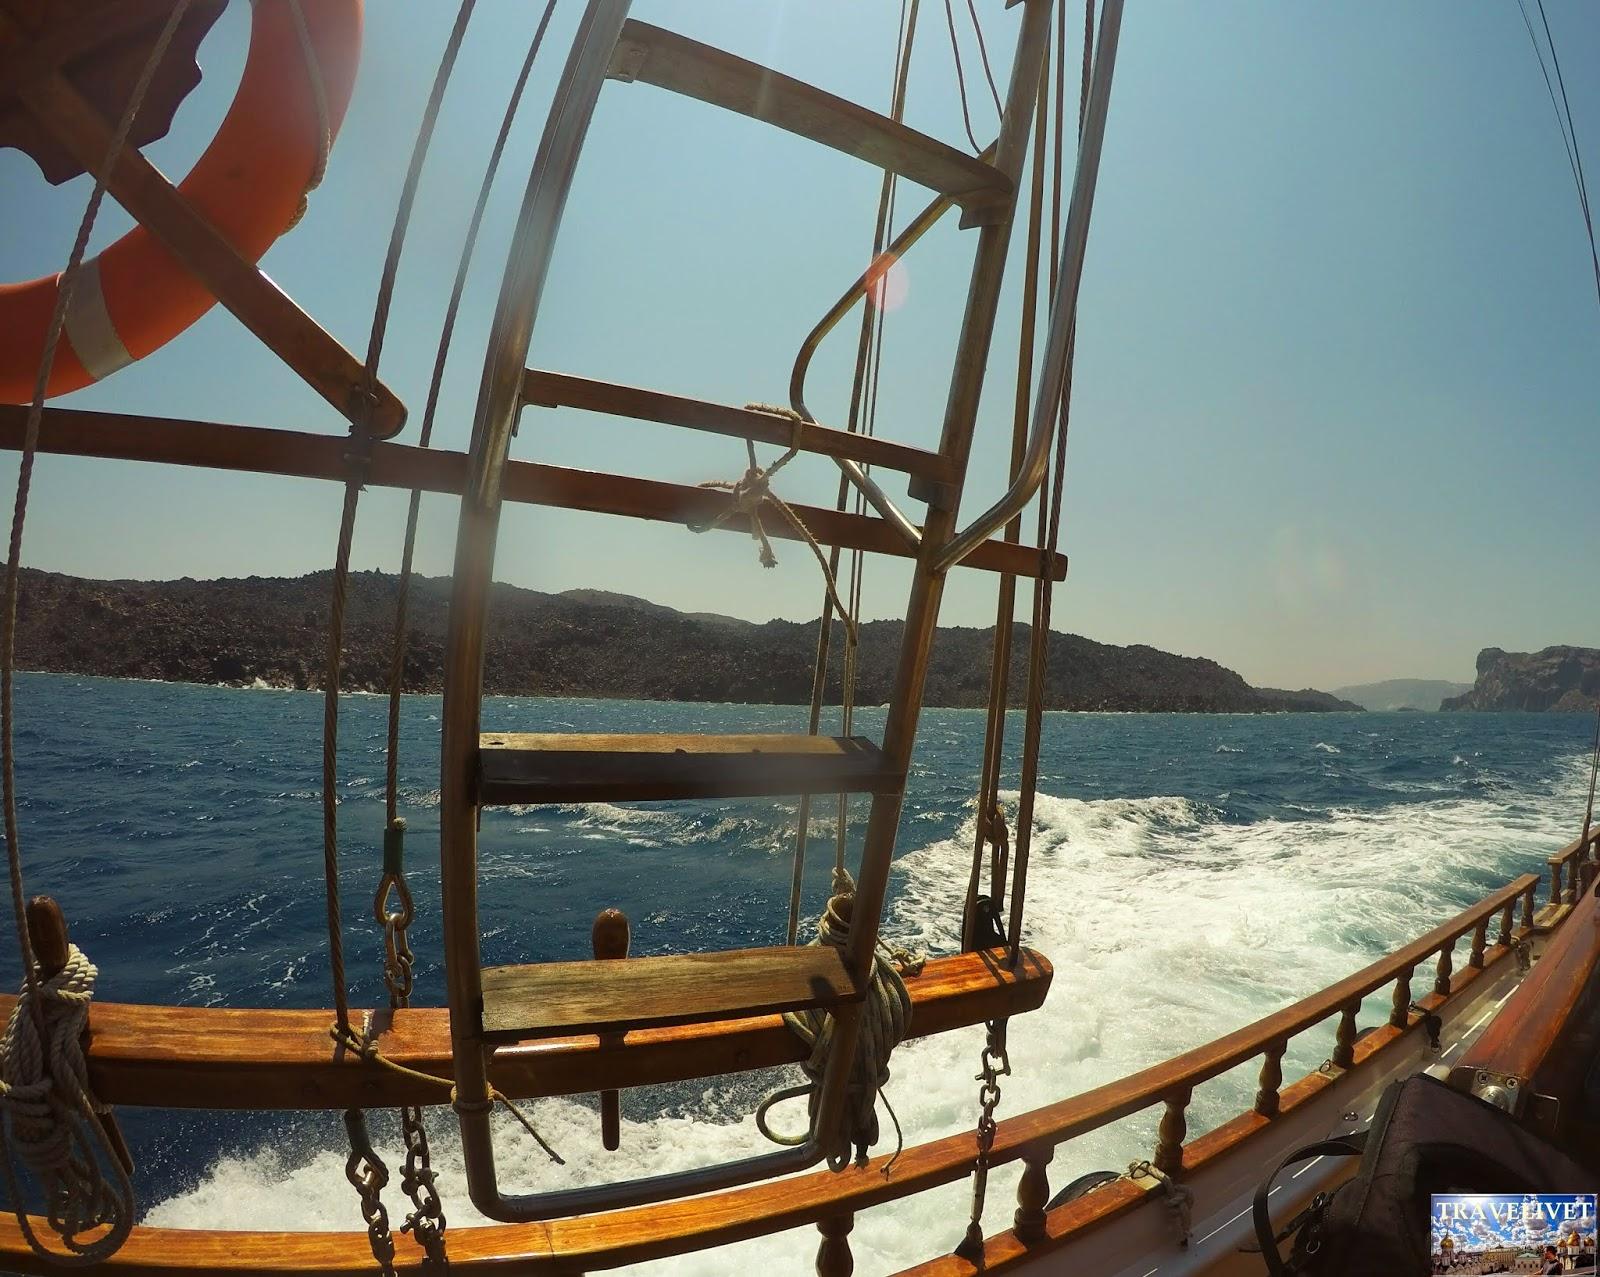 Grèce Santorini Santorin croisière